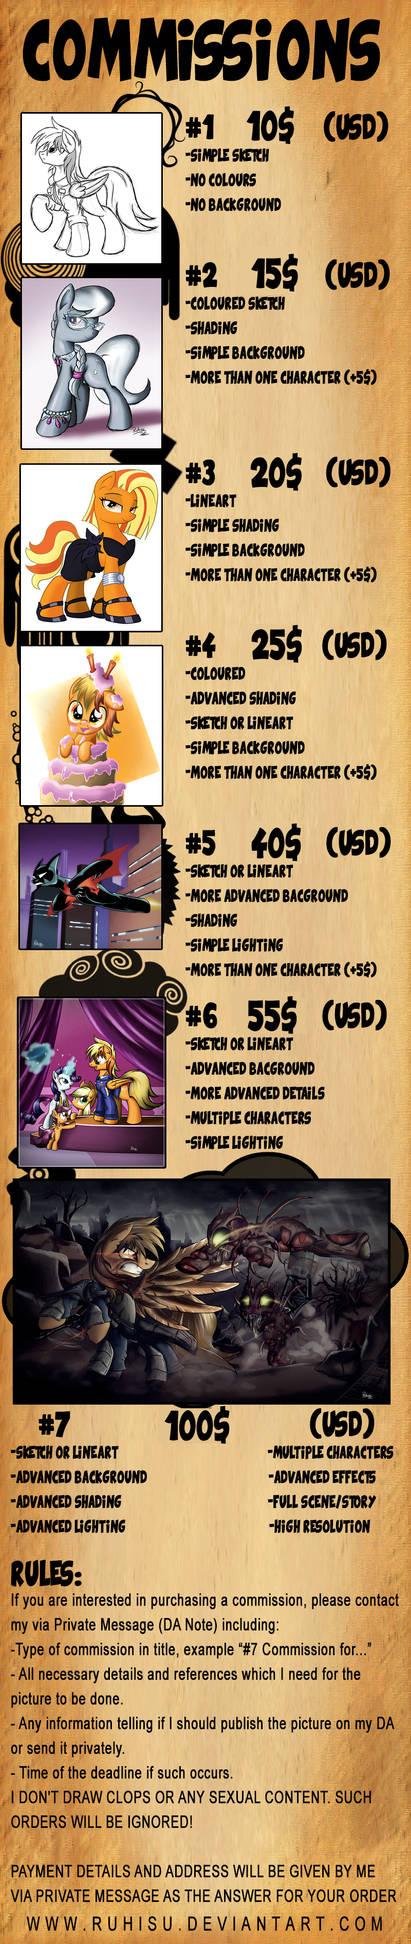 Commission Info by Ruhisu